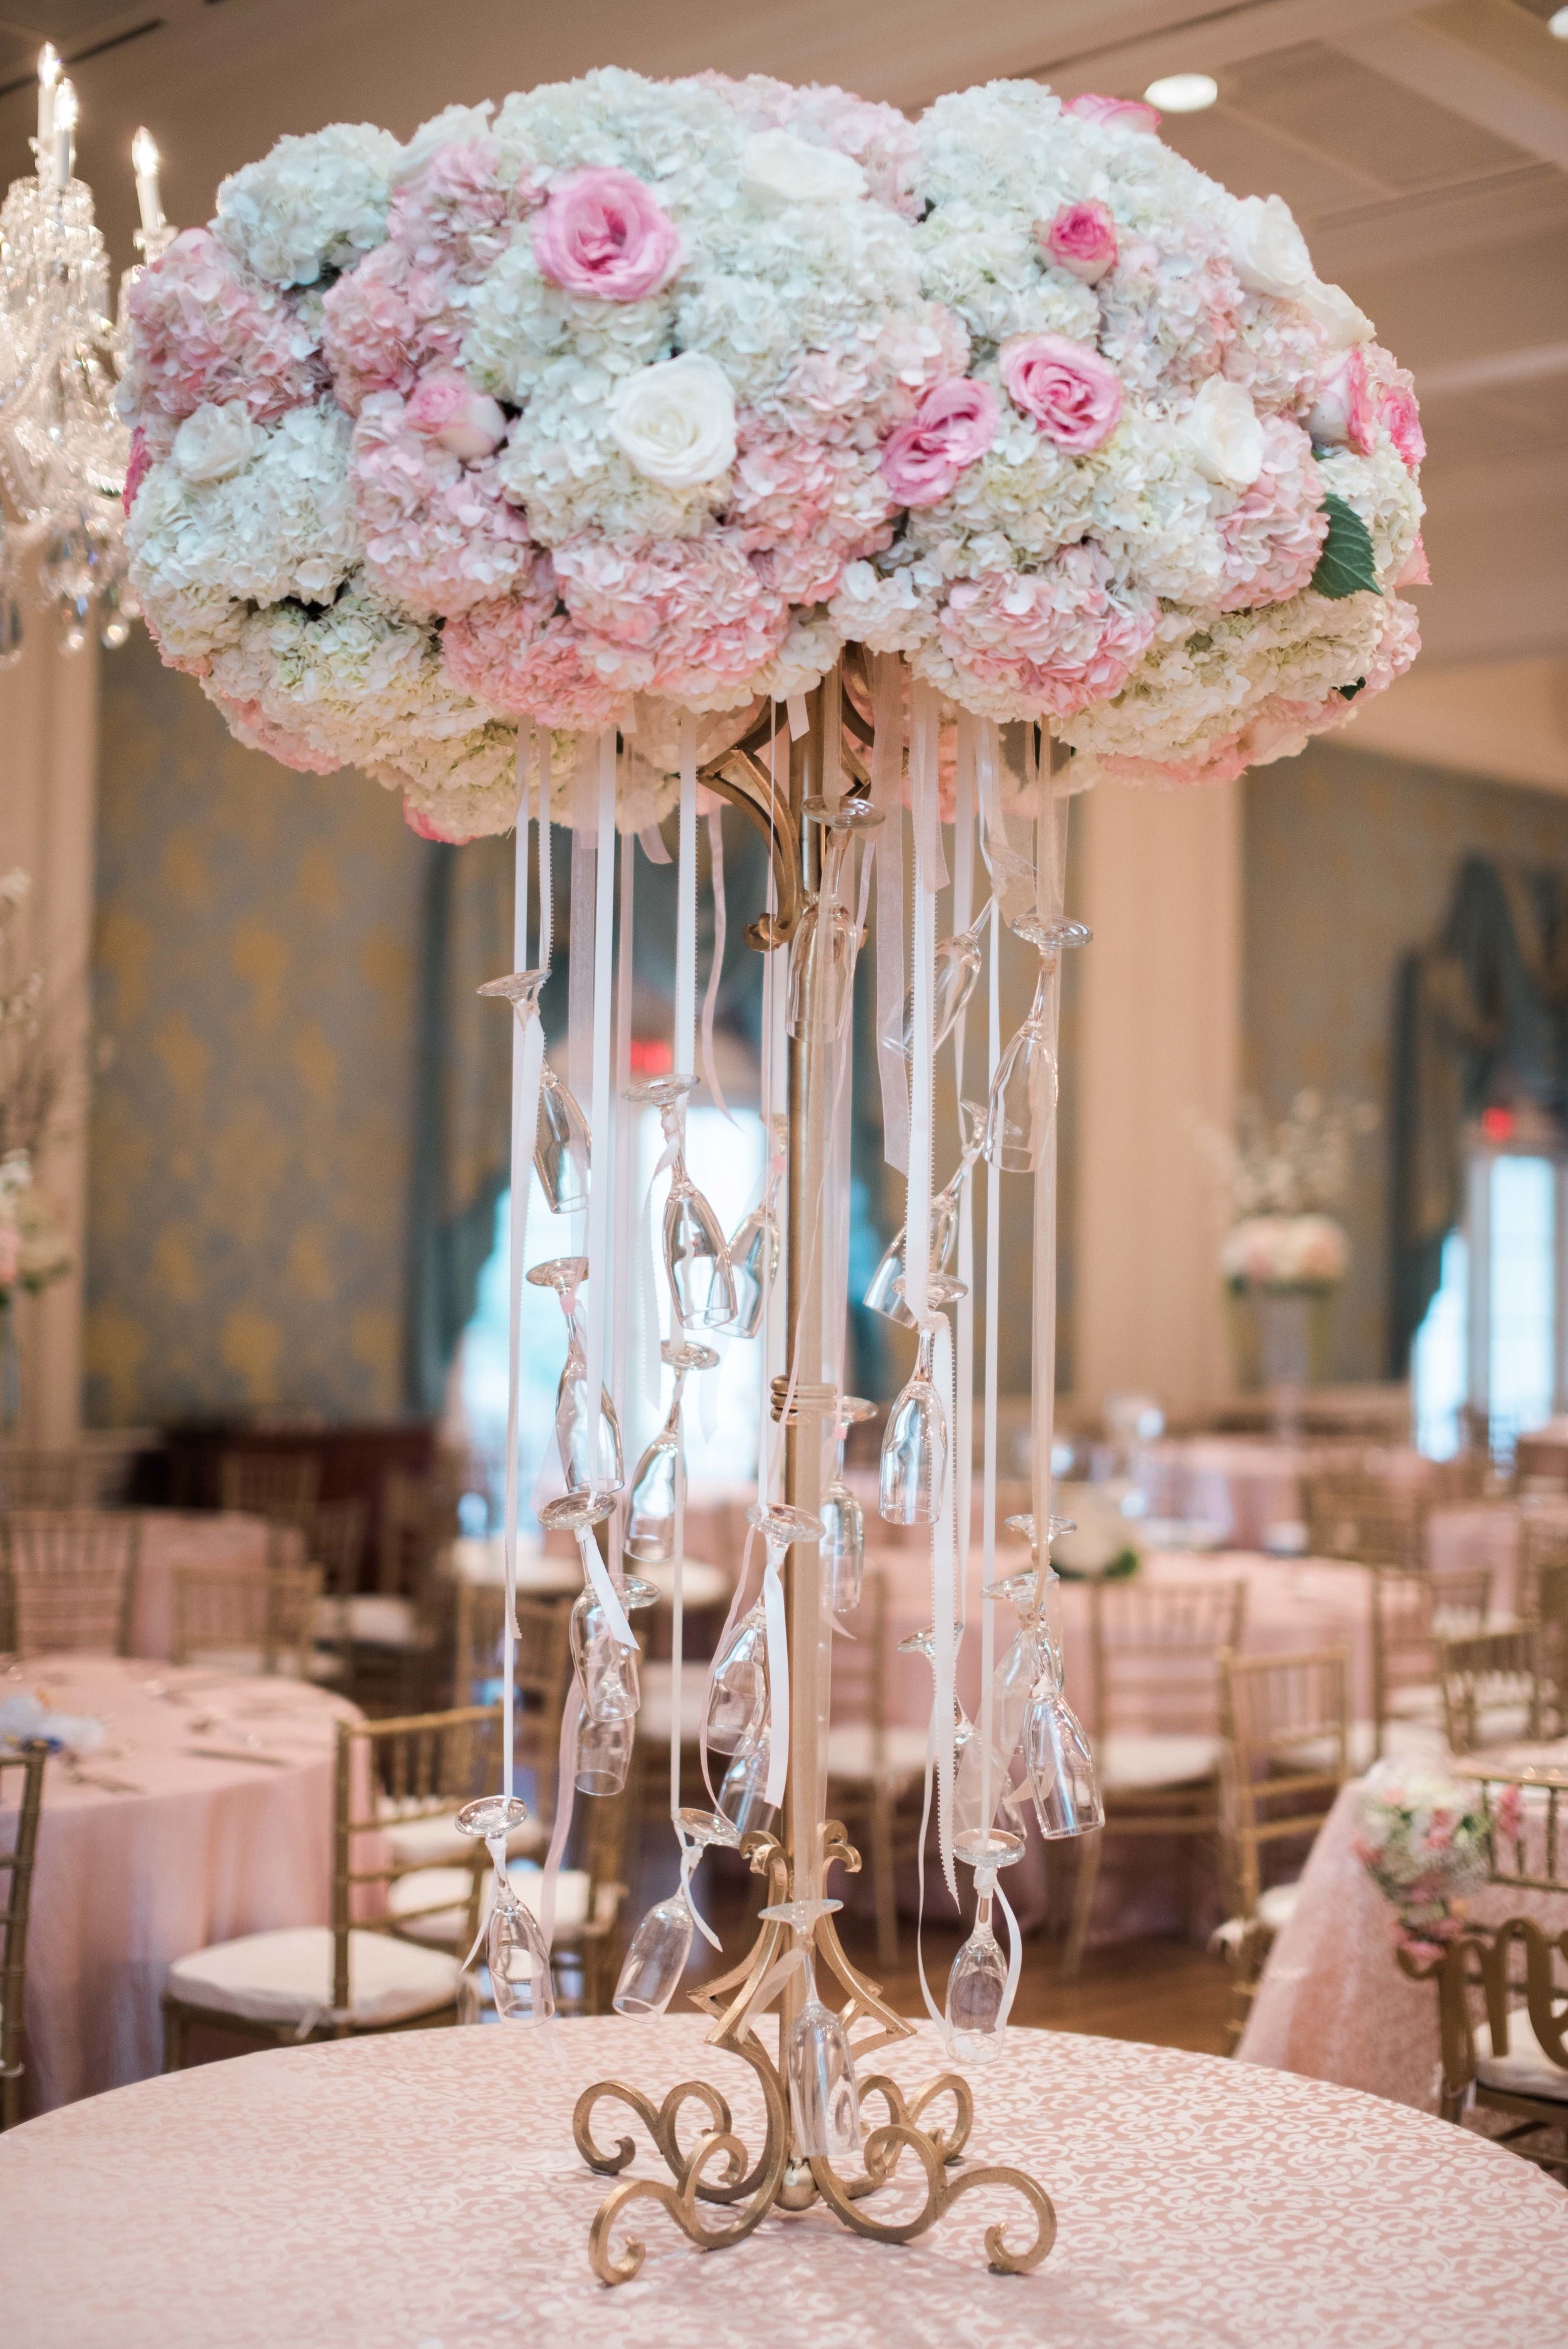 Dana-Fernandez-Photography-Weddings-in-Houston-Magazine-feature-Houston-wedding-photographer-film-38.jpg